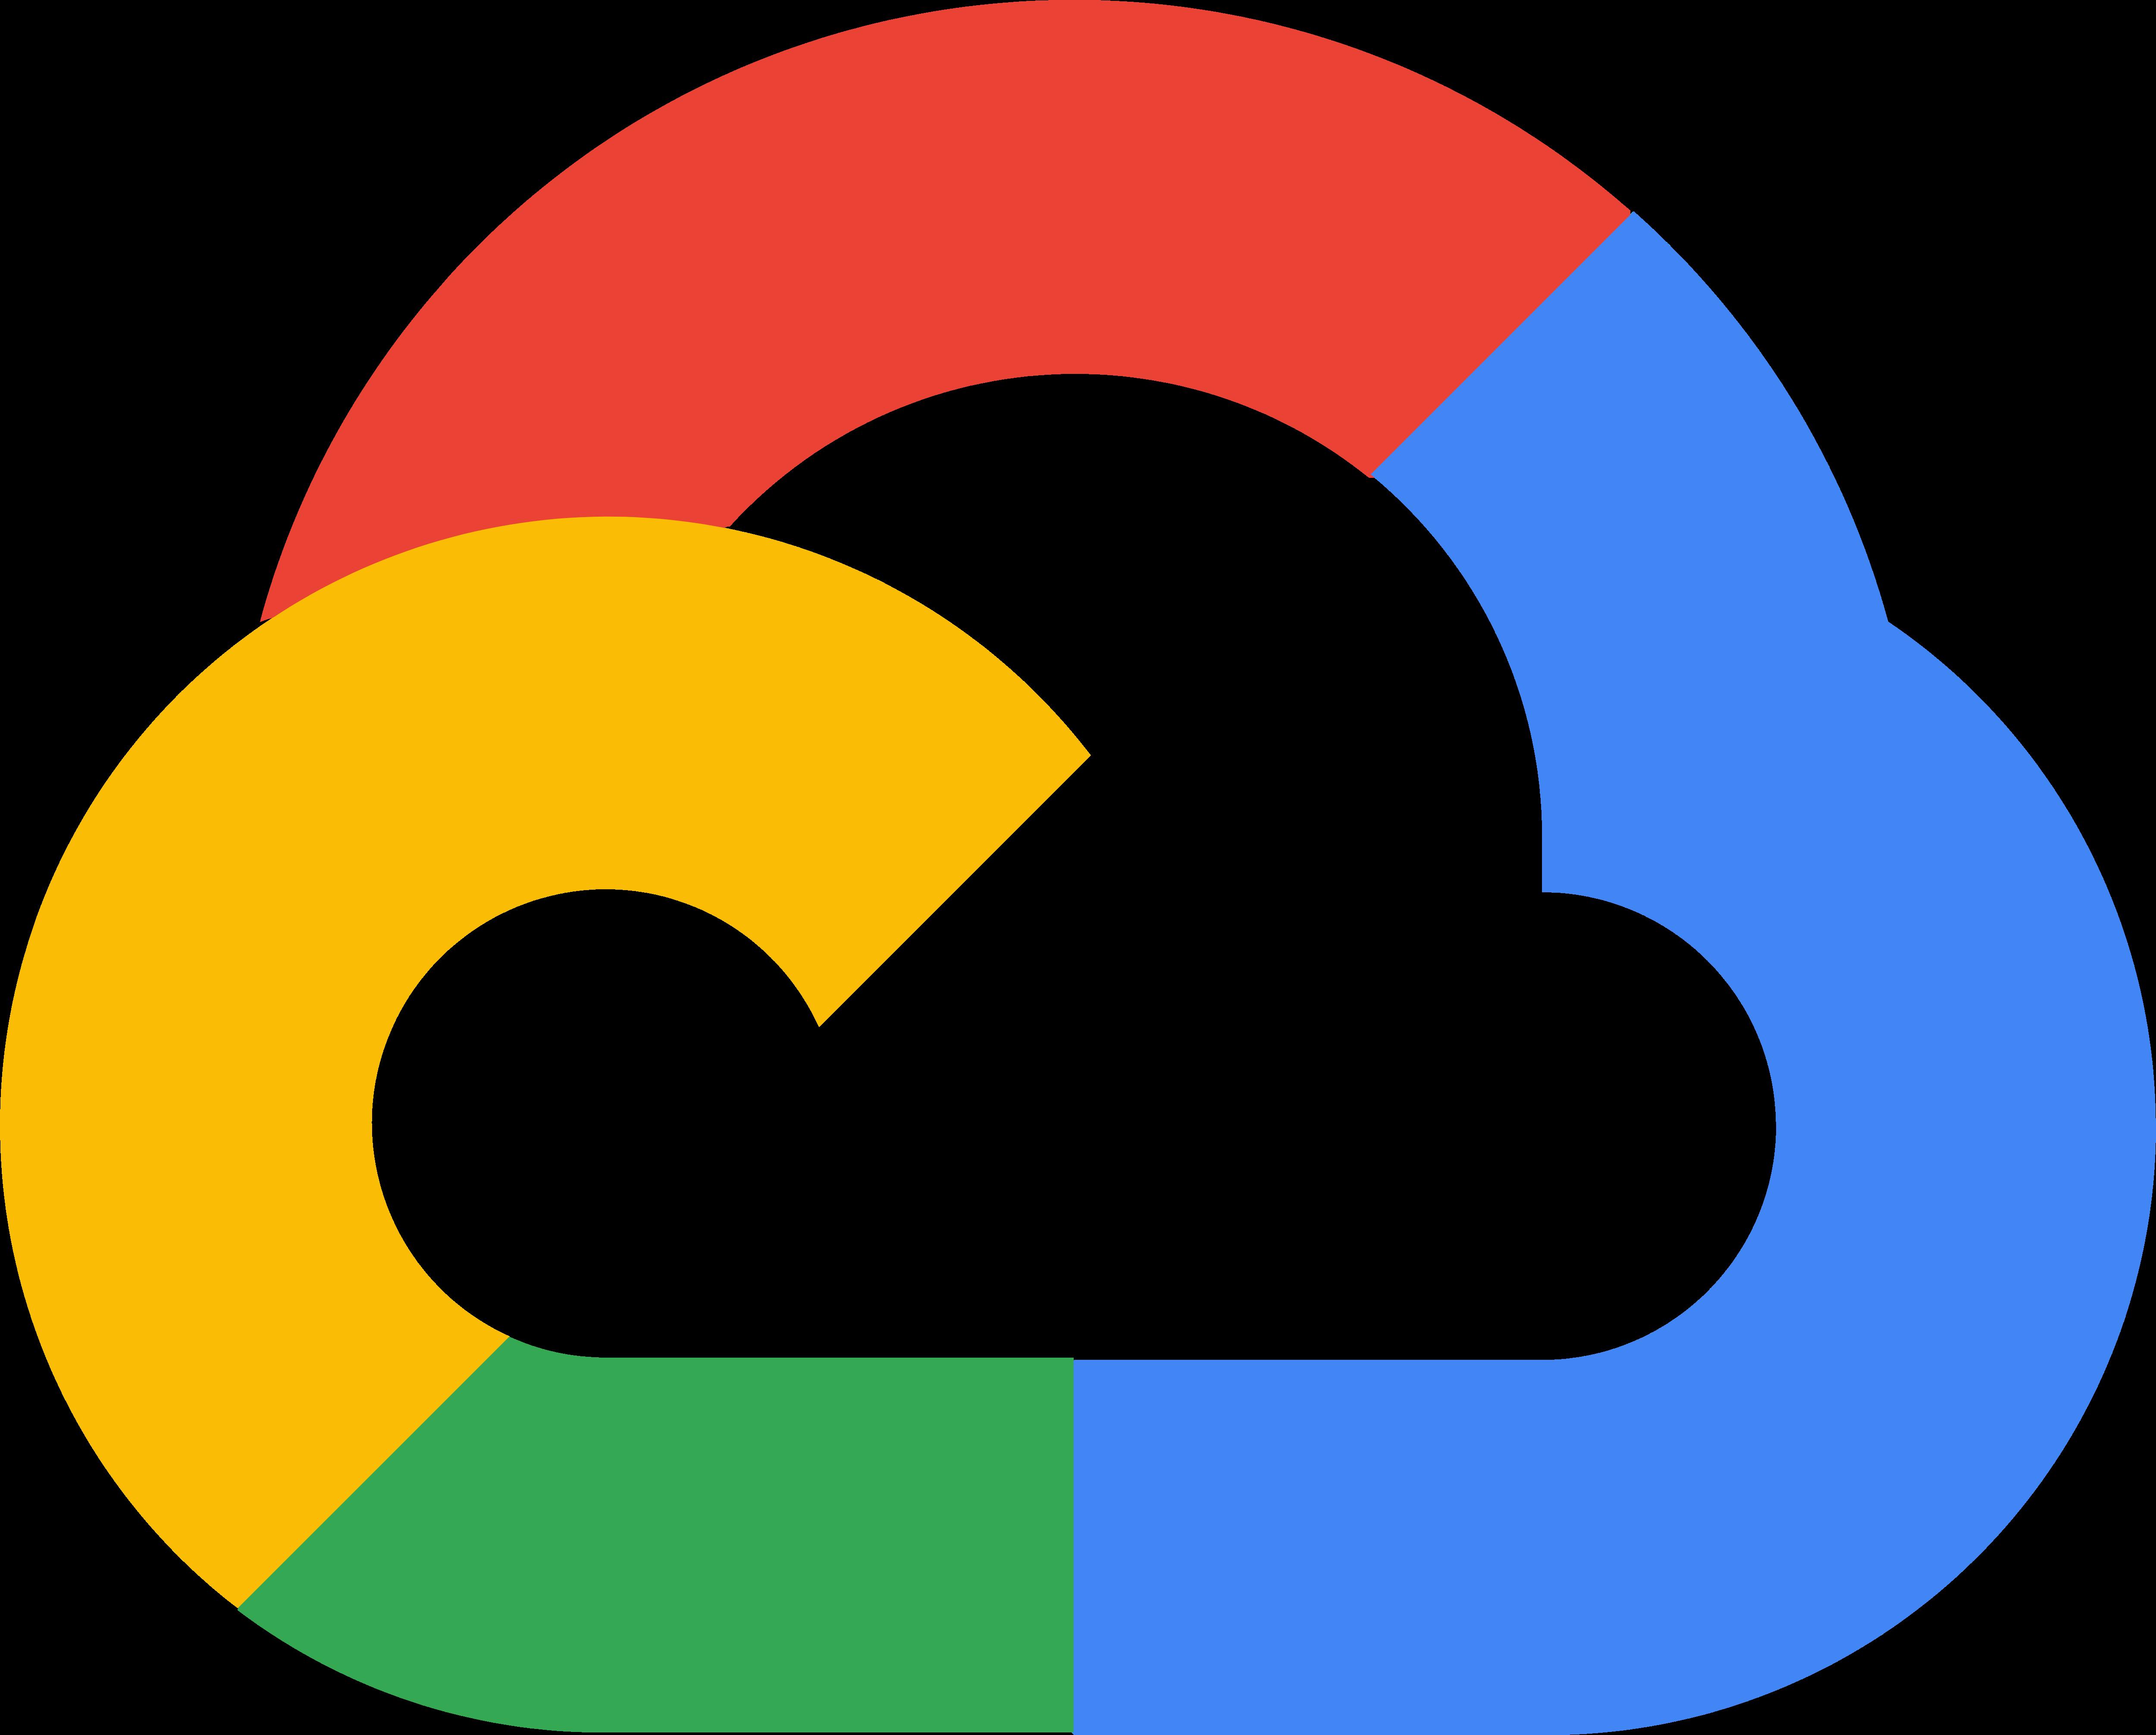 GOOGLE adds - Logos Download